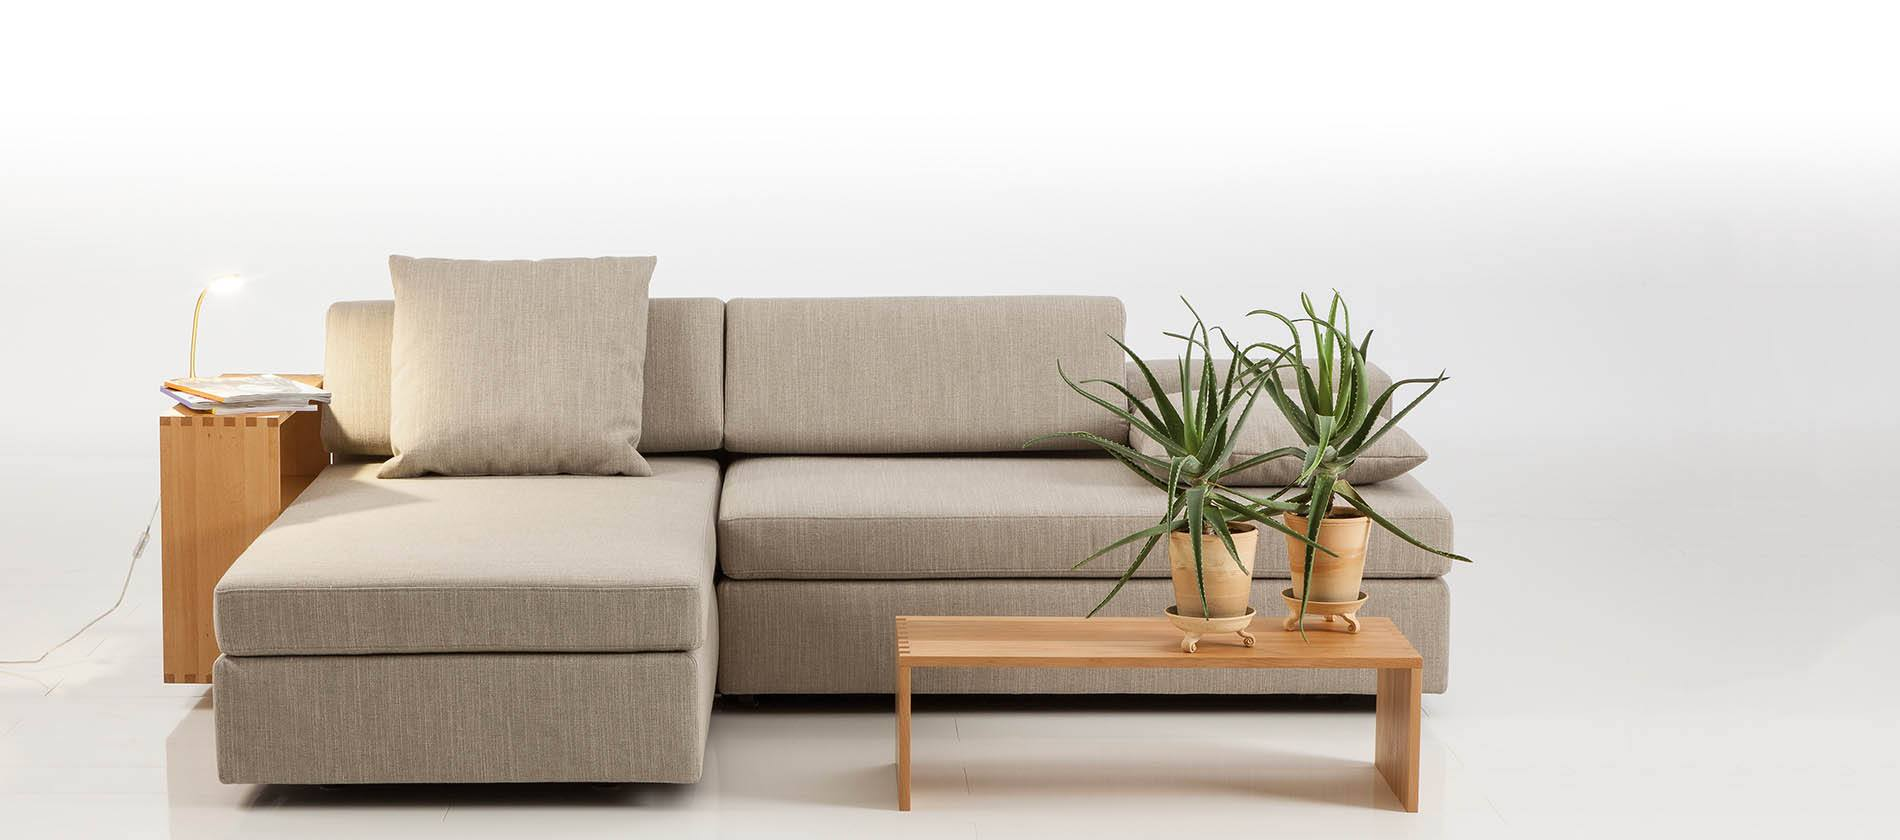 schlafsofa clip von br hl. Black Bedroom Furniture Sets. Home Design Ideas